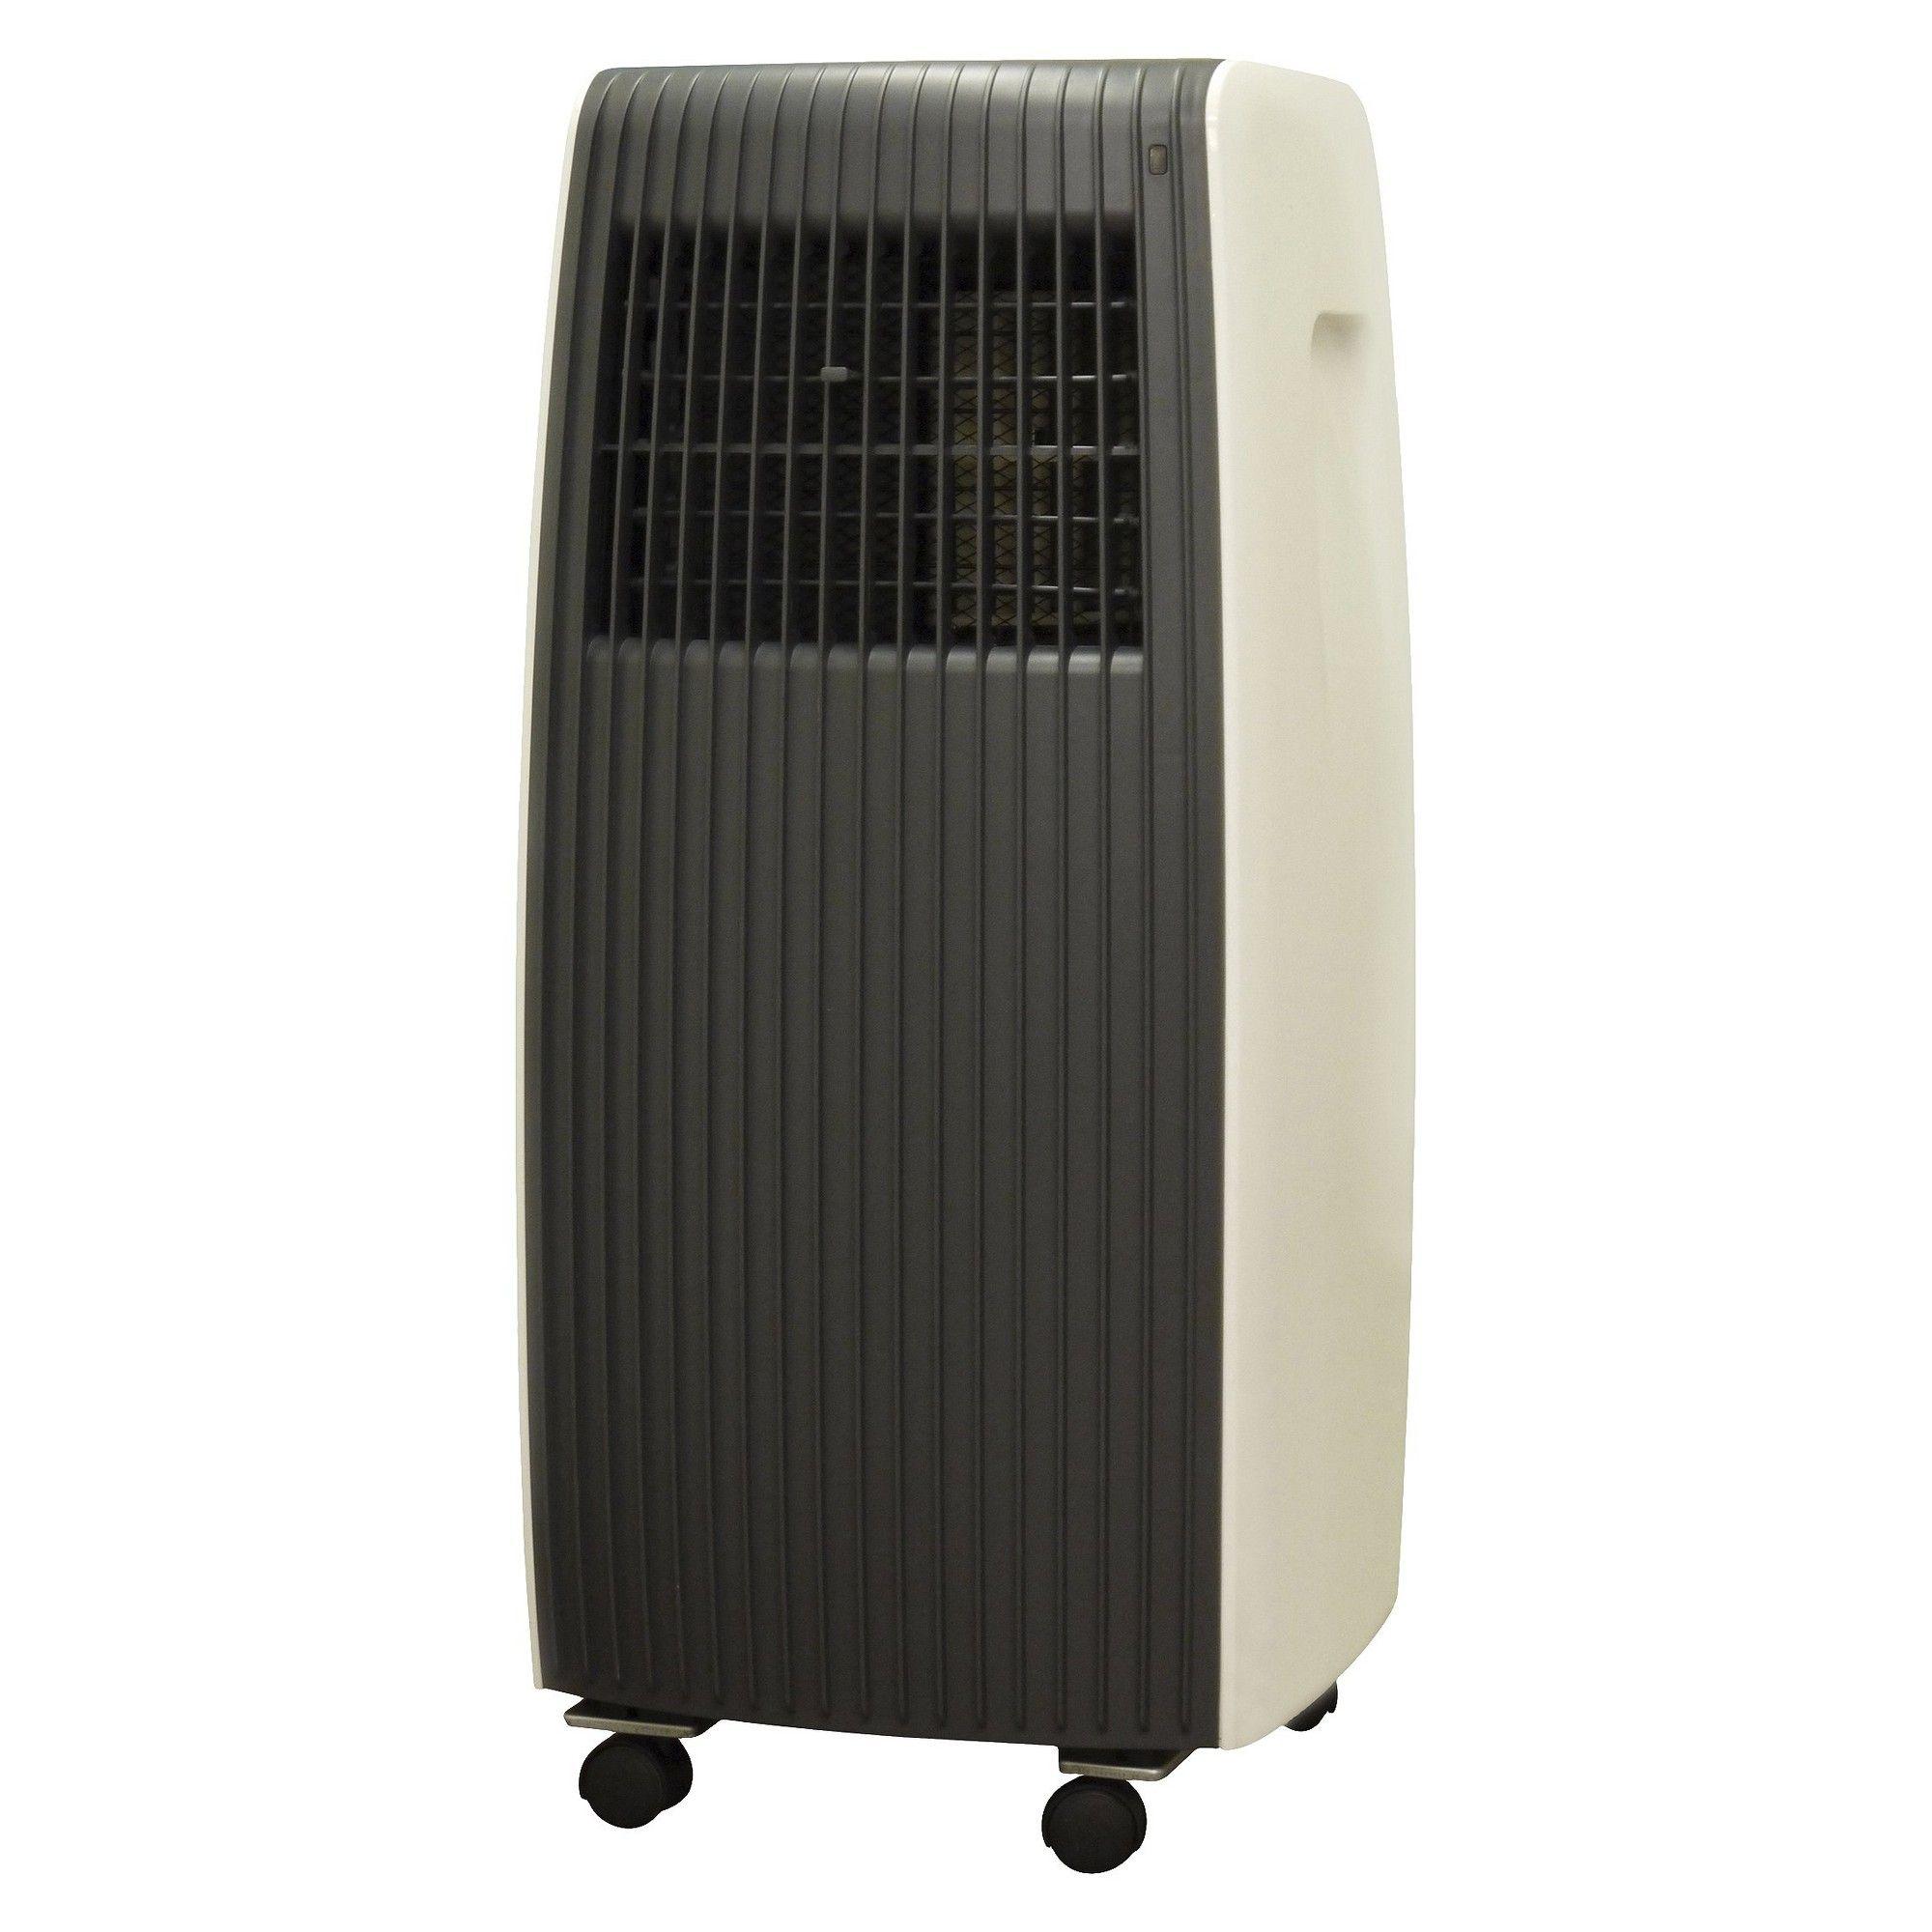 Sunpentown 8000Btu Portable Air Conditioner Portable